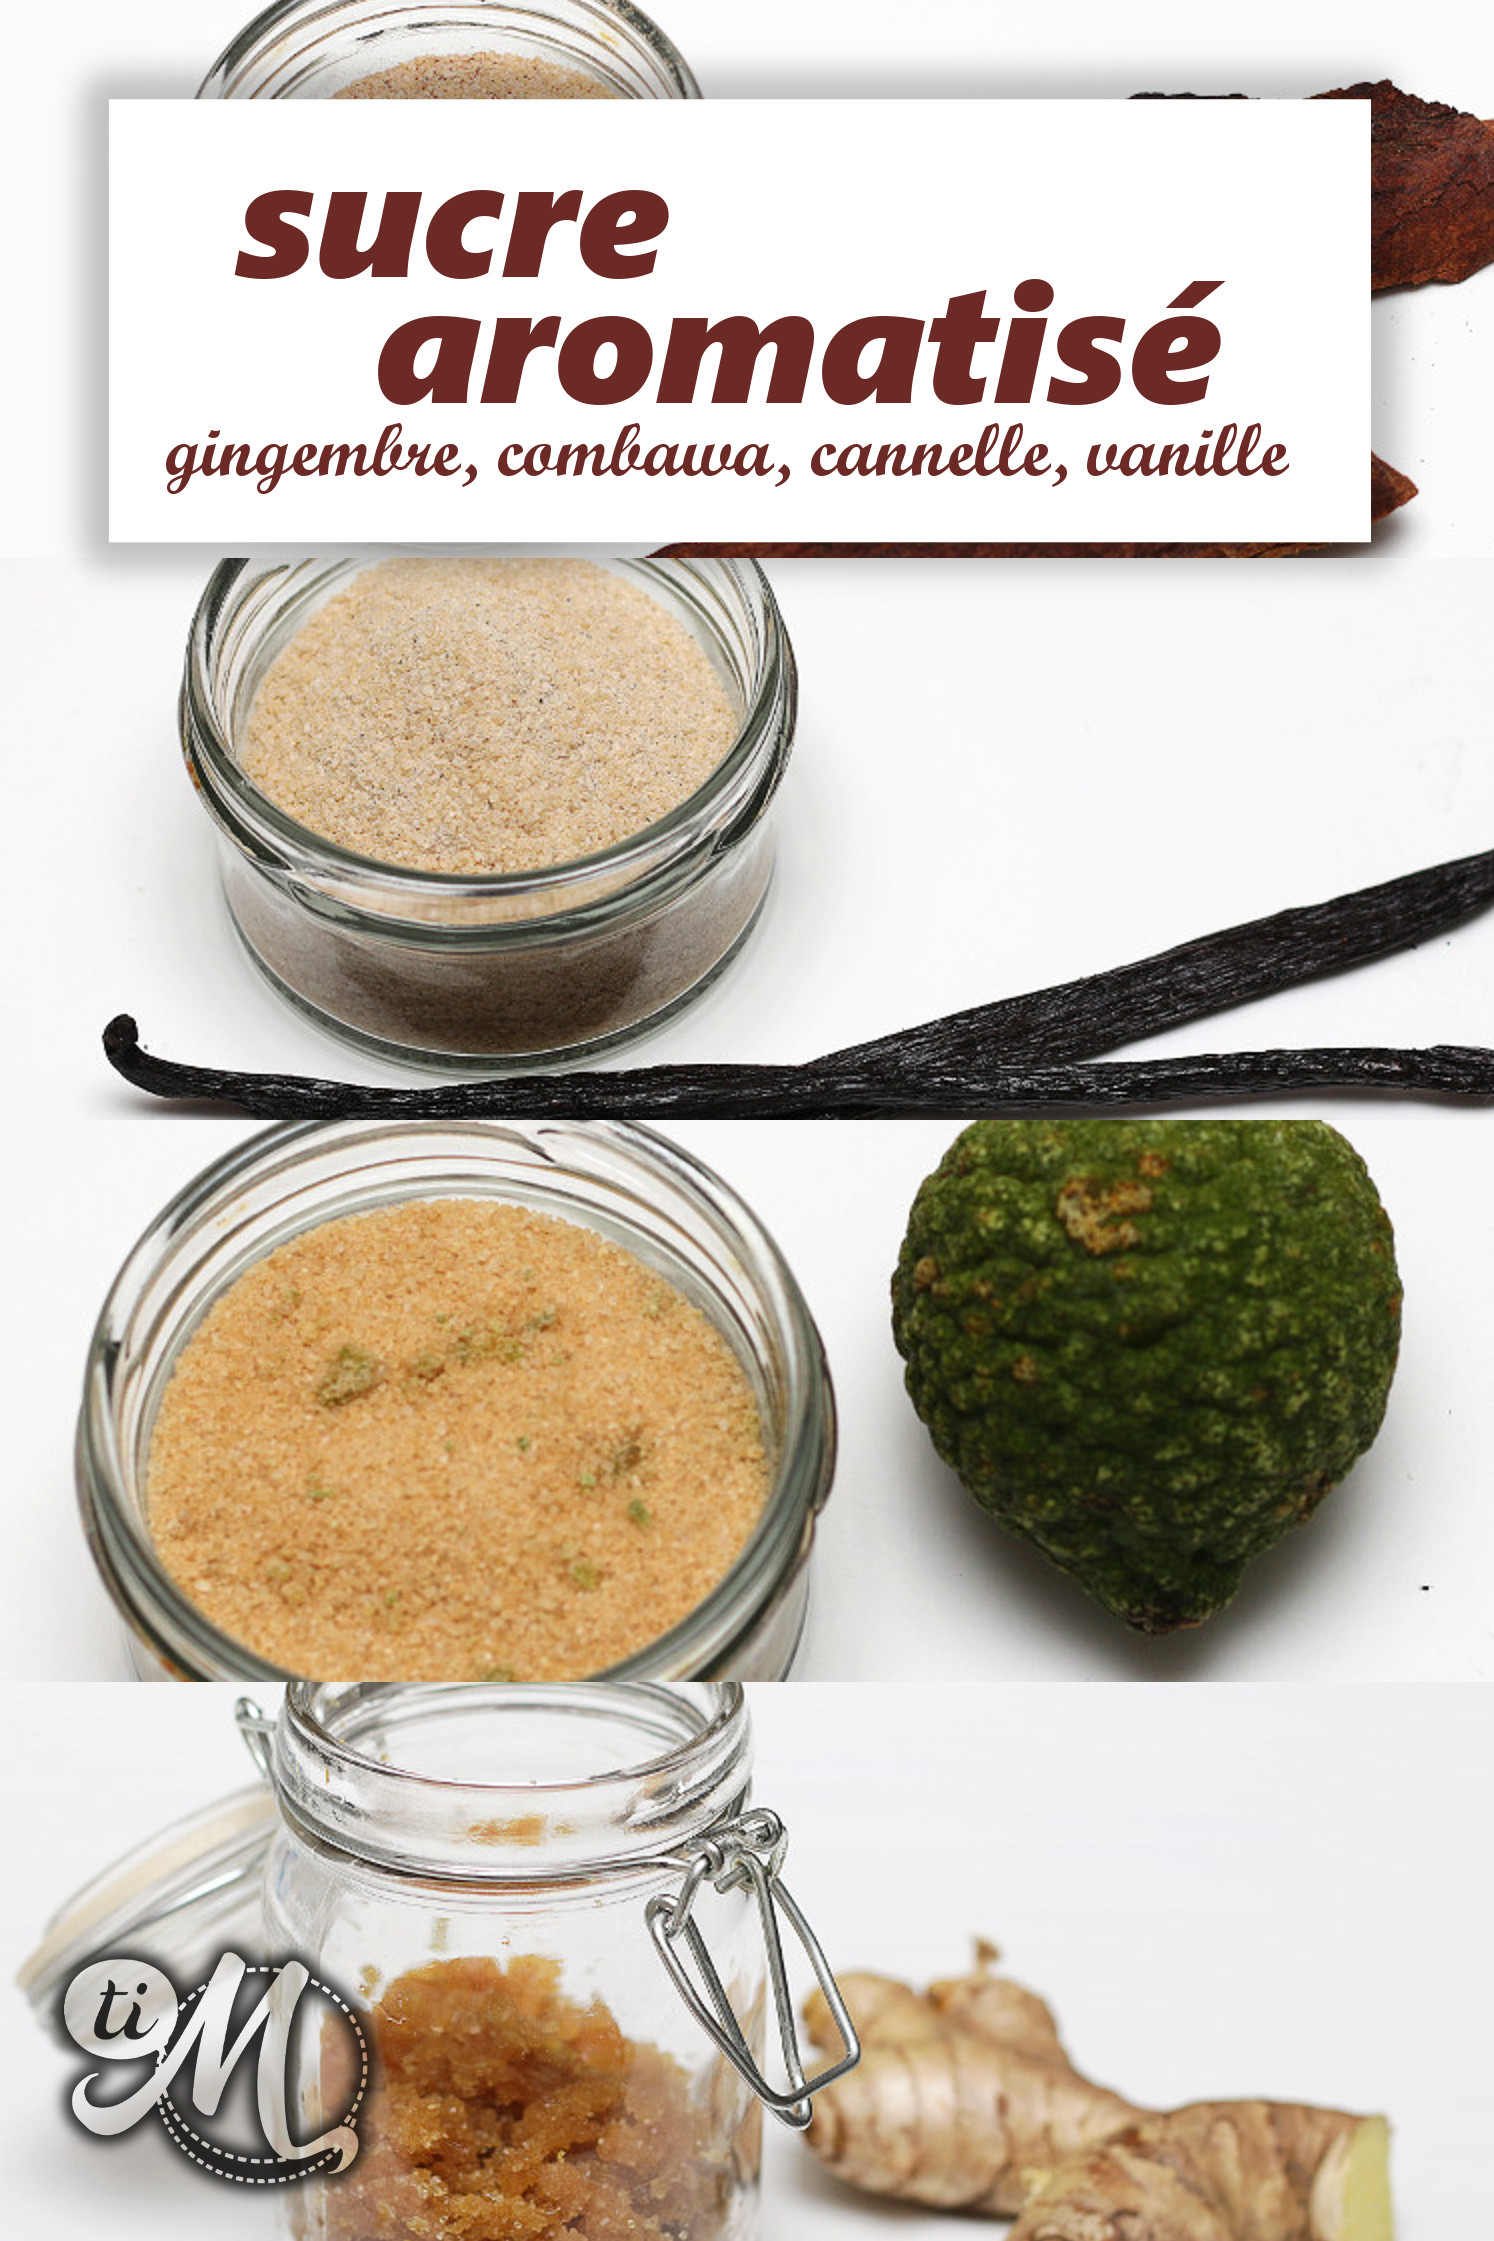 timolokoy-sucre-aromatise-16(02)